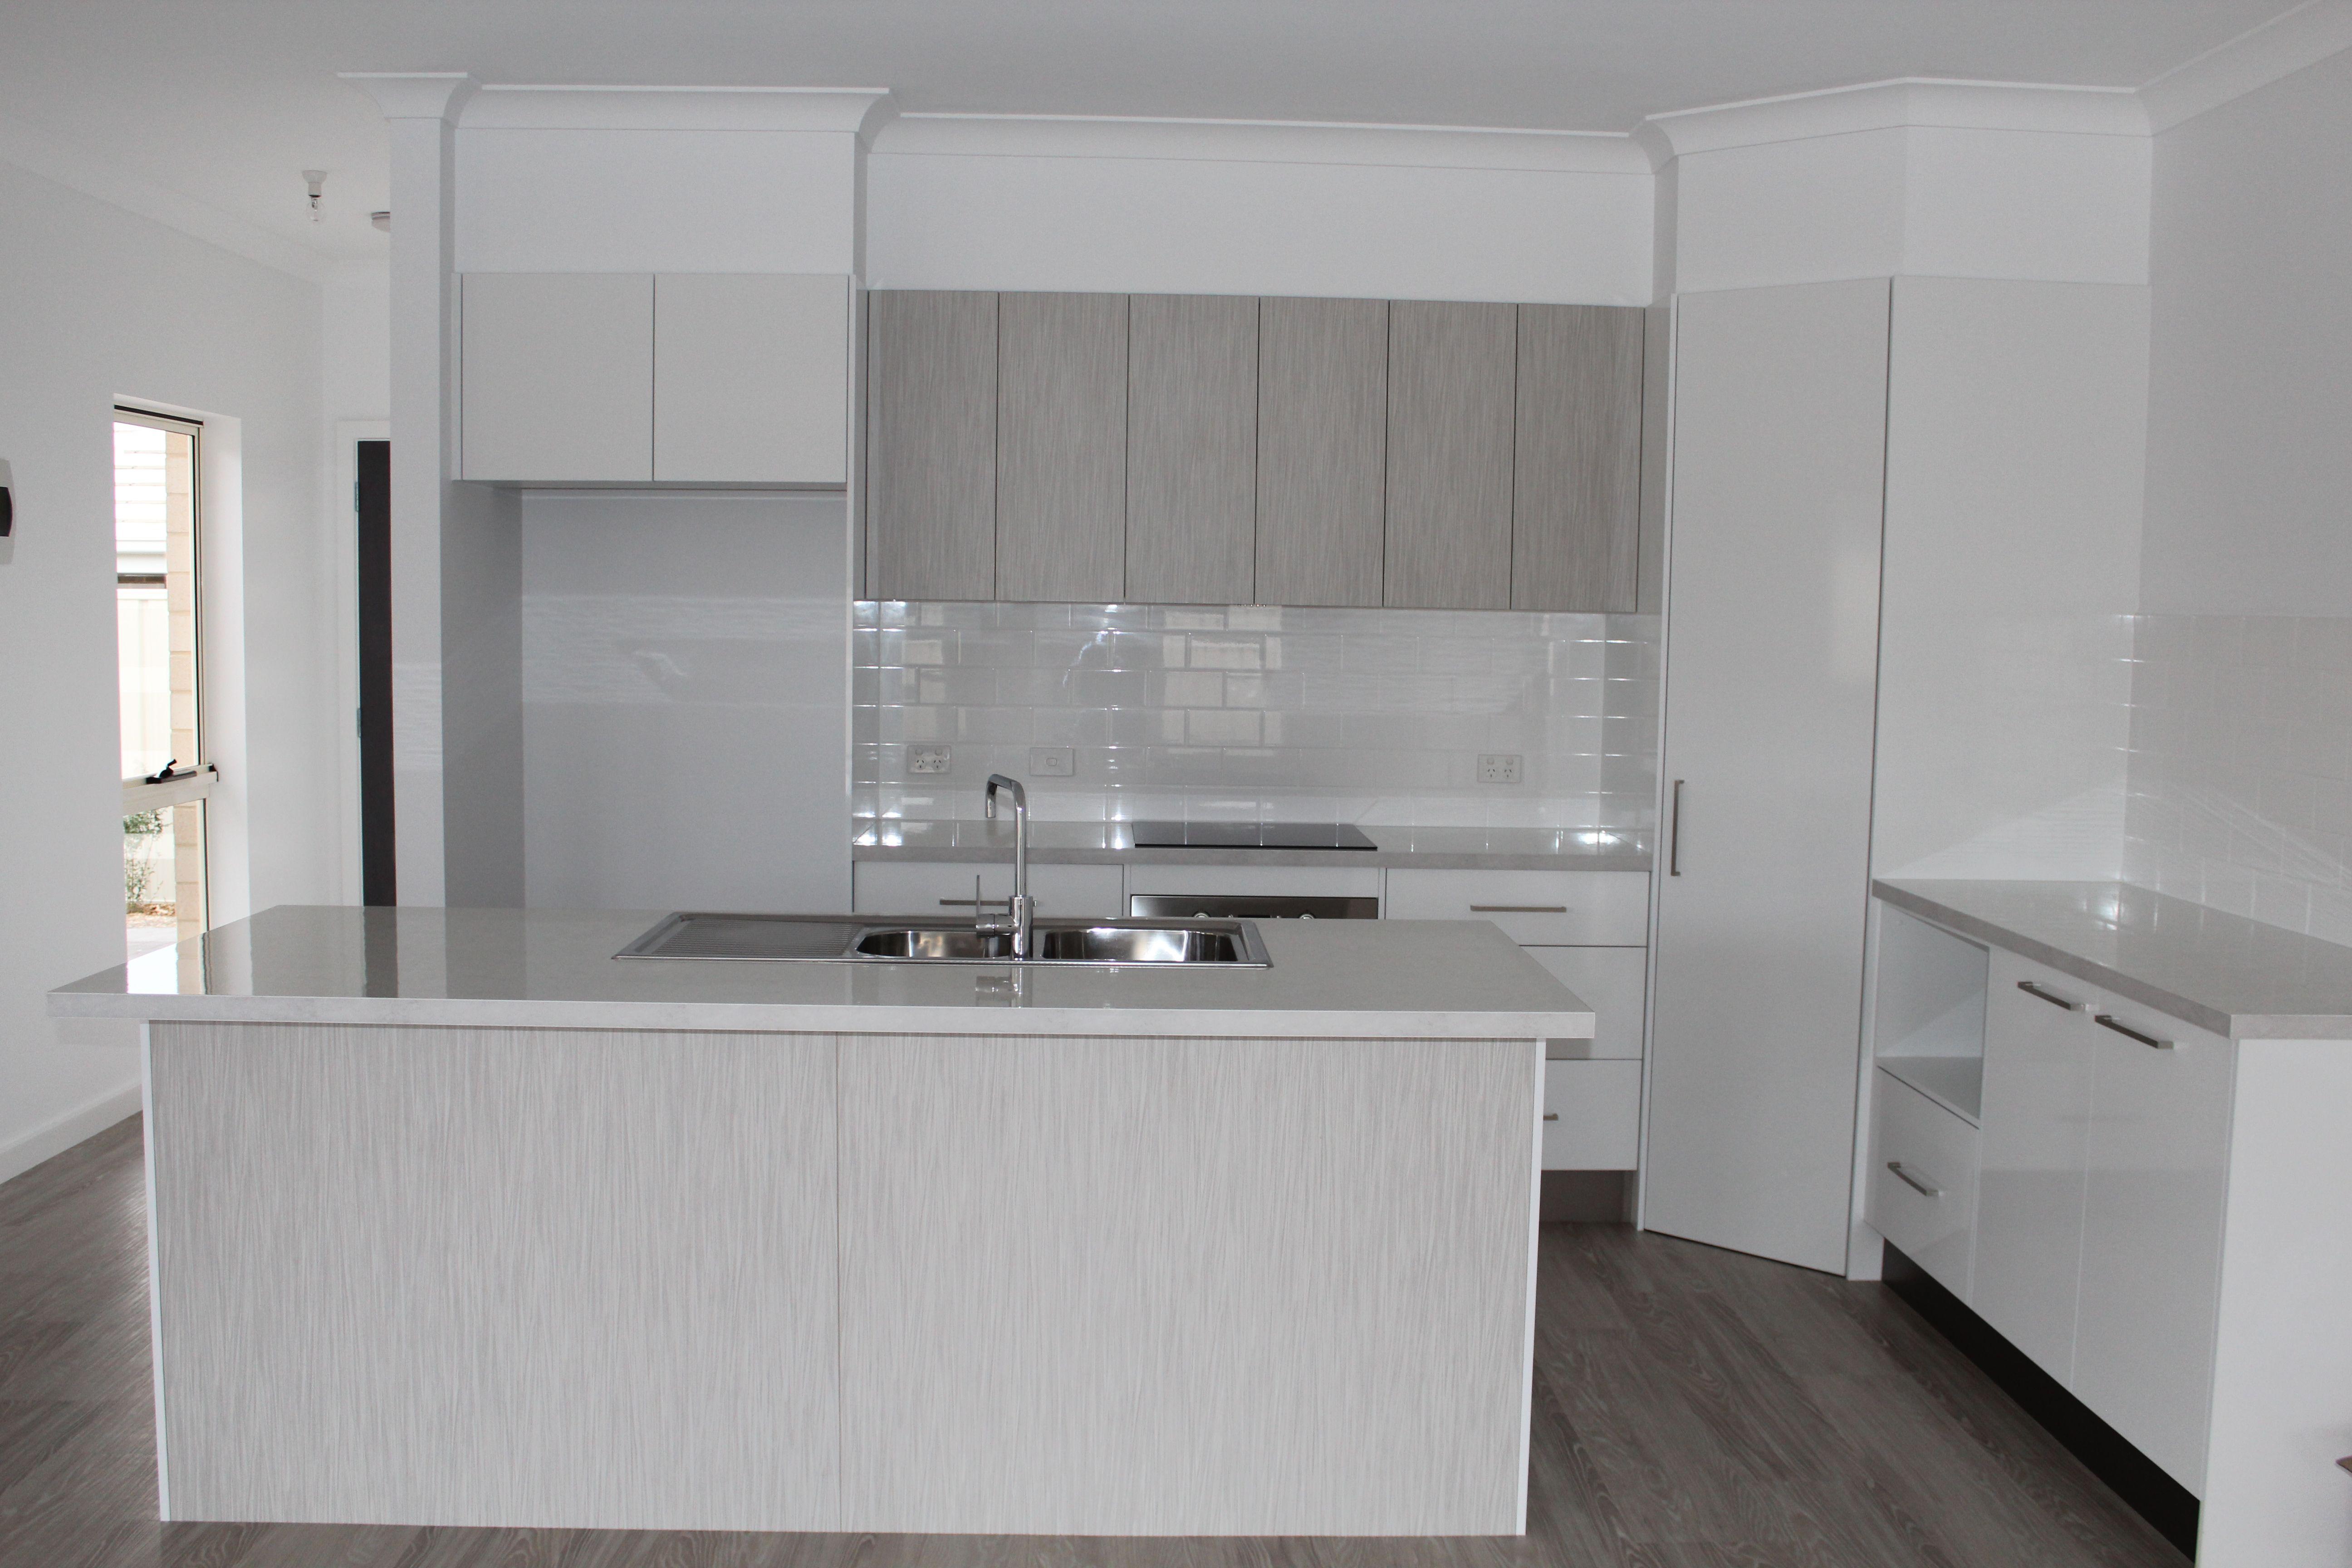 Benchtop Laminex White Valencia Diamond Gloss Panels